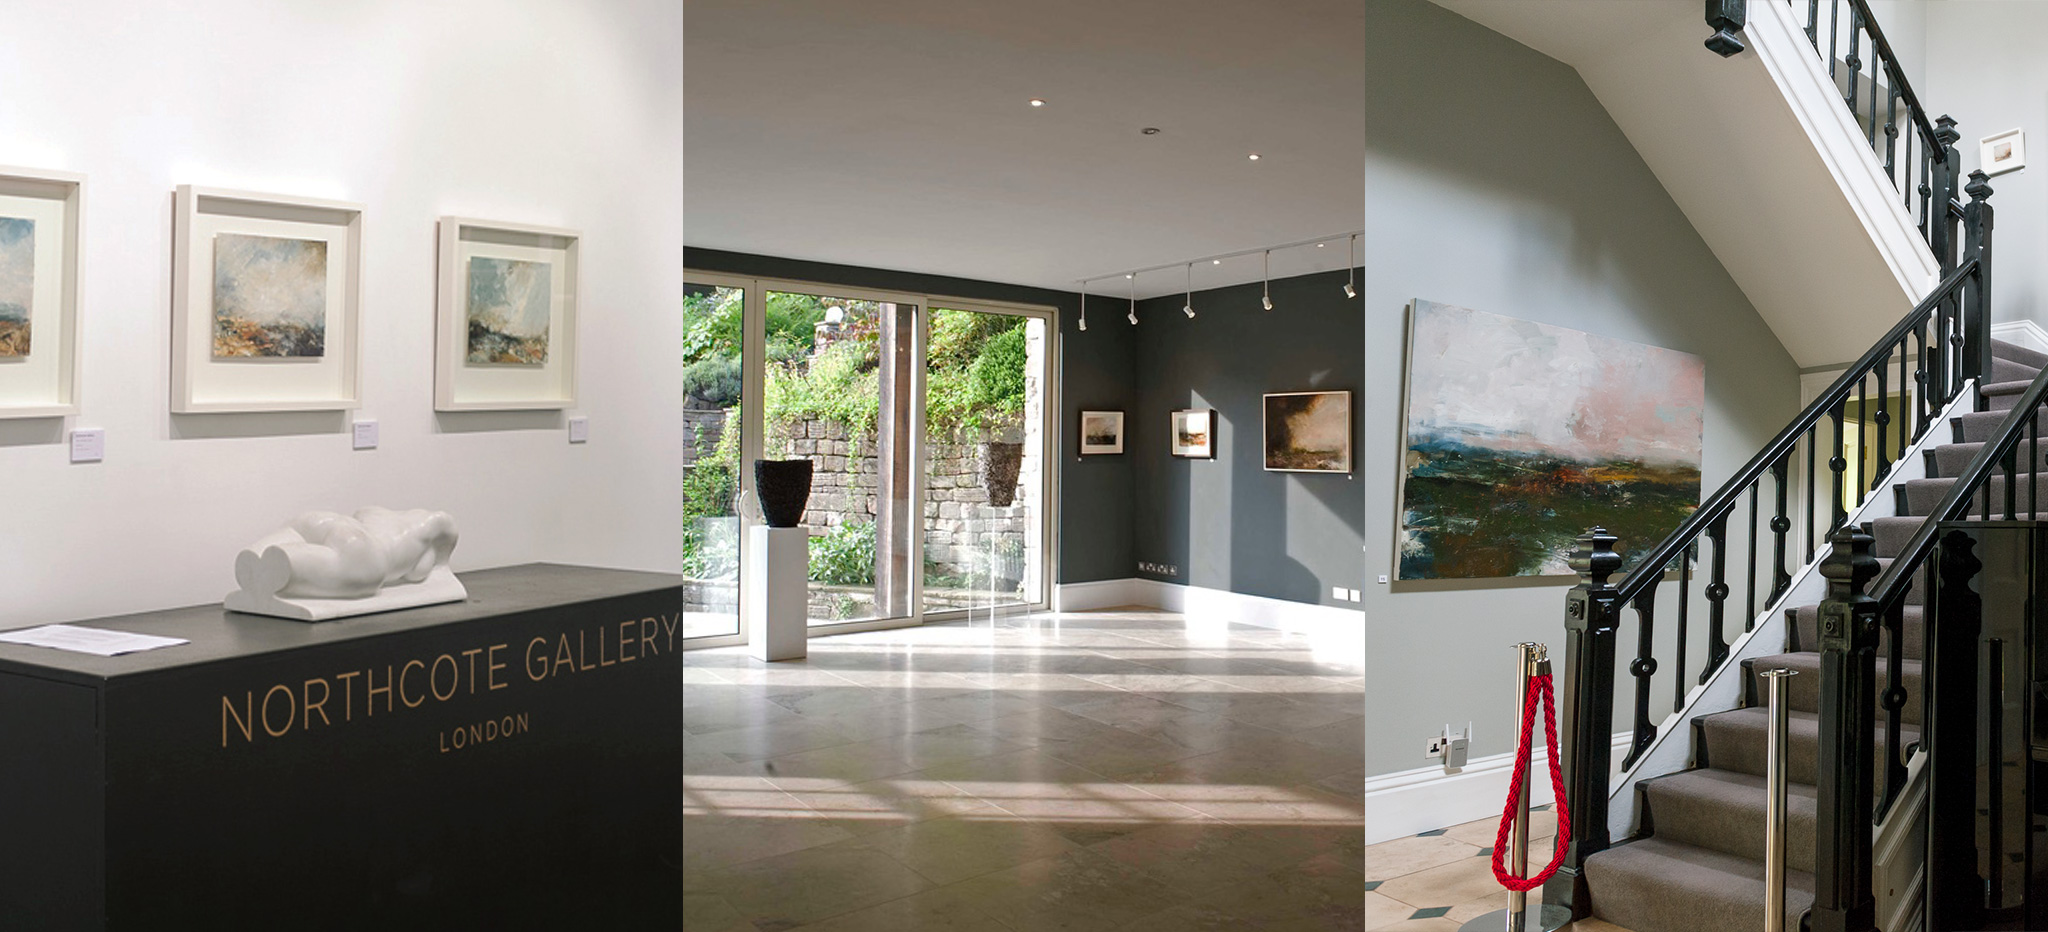 exhibitions-header.jpg